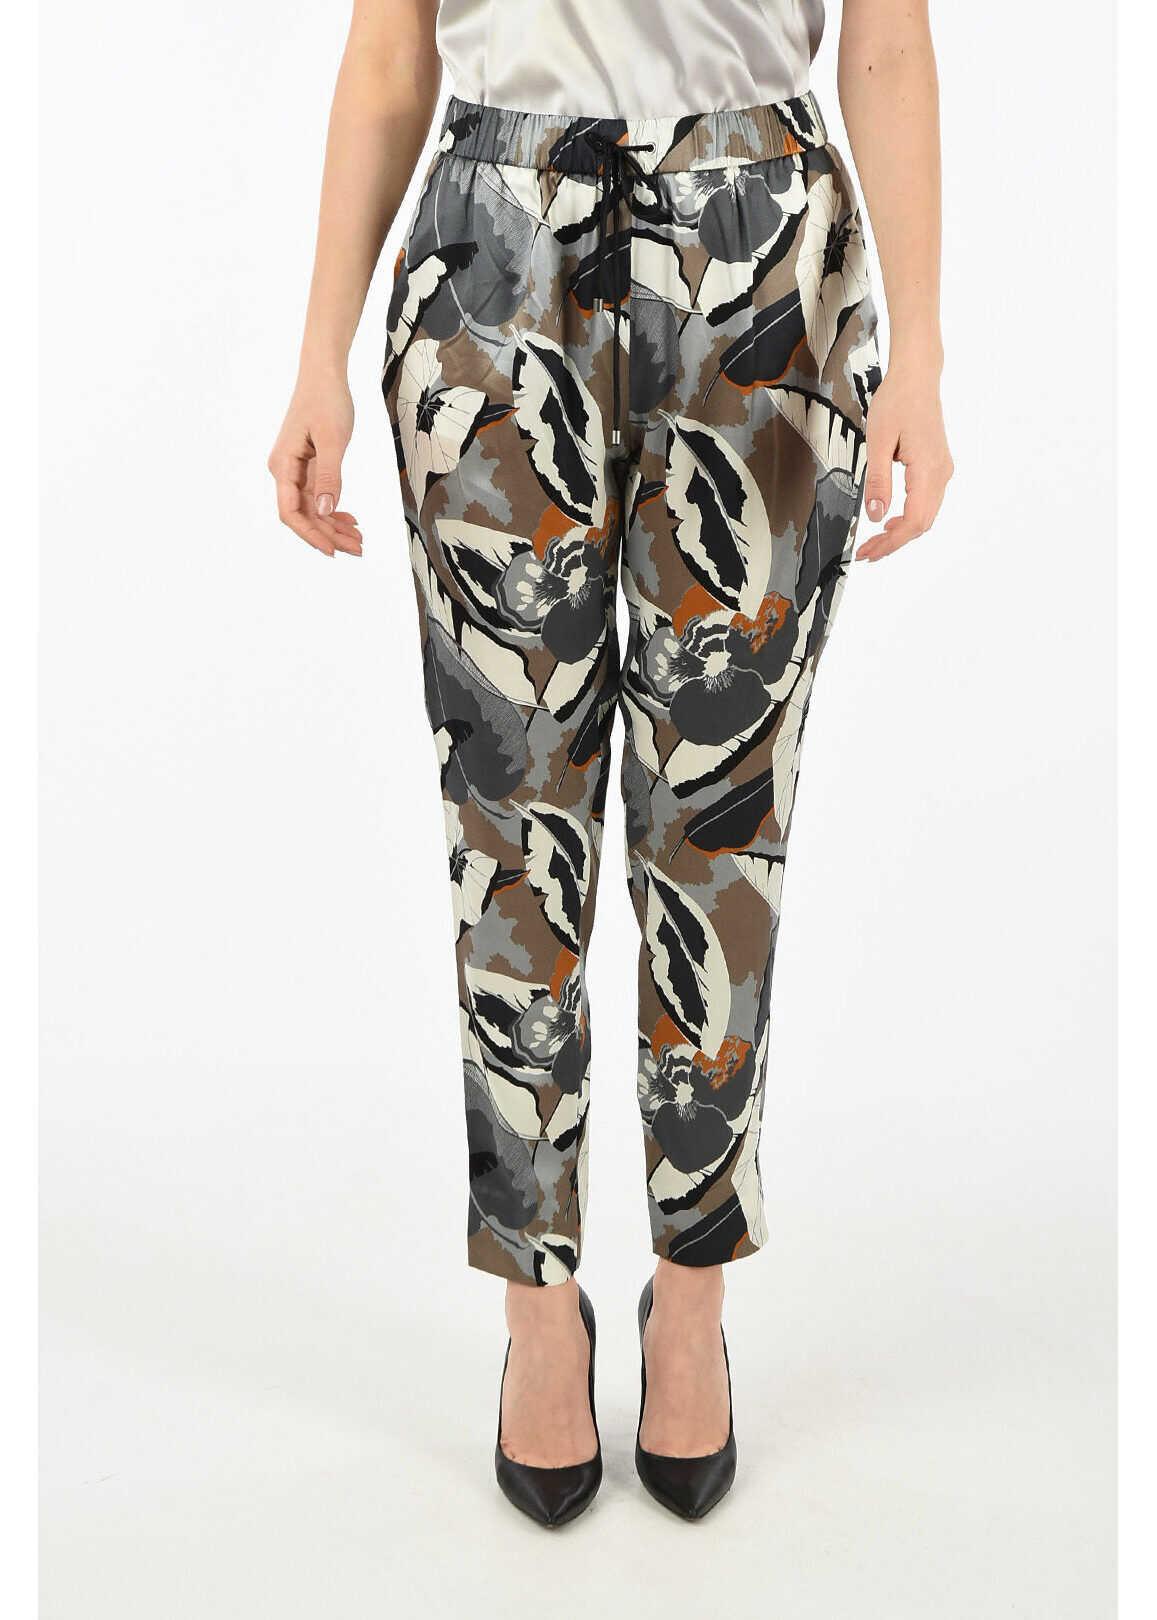 Fabiana Filippi silk floral-print pants MULTICOLOR